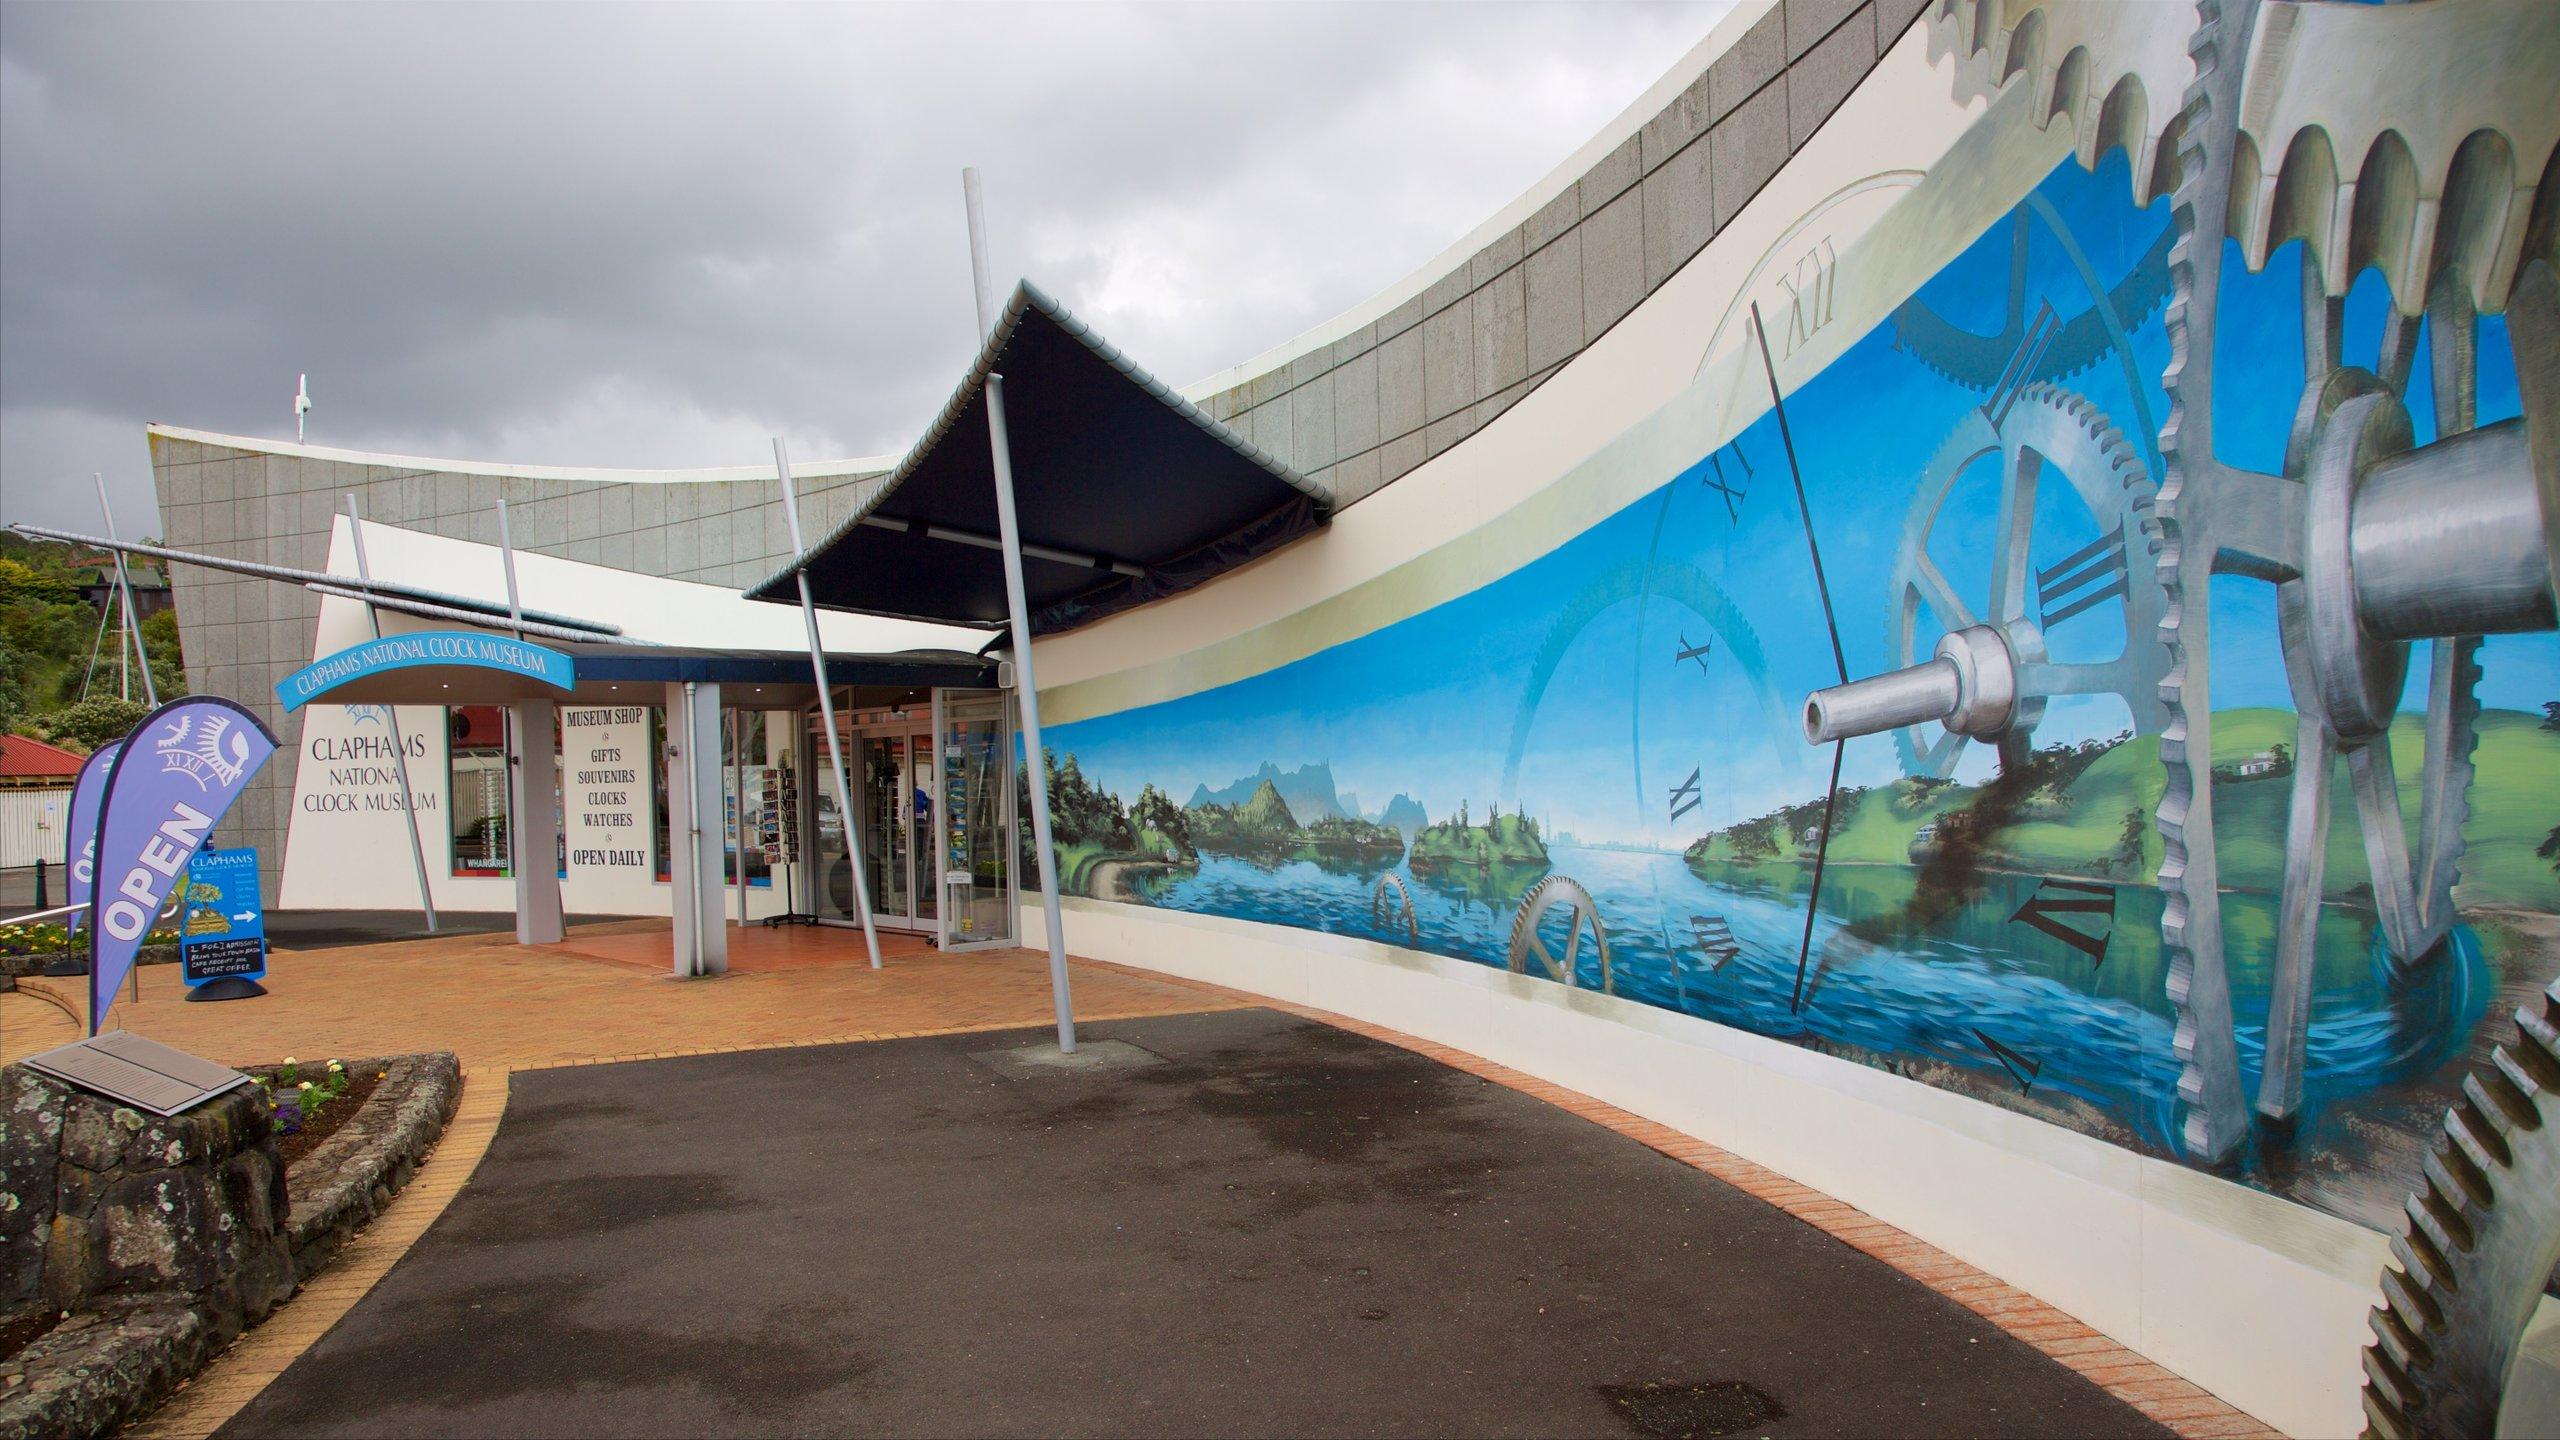 Claphams Clocks, Whangarei, Northland, Neuseeland